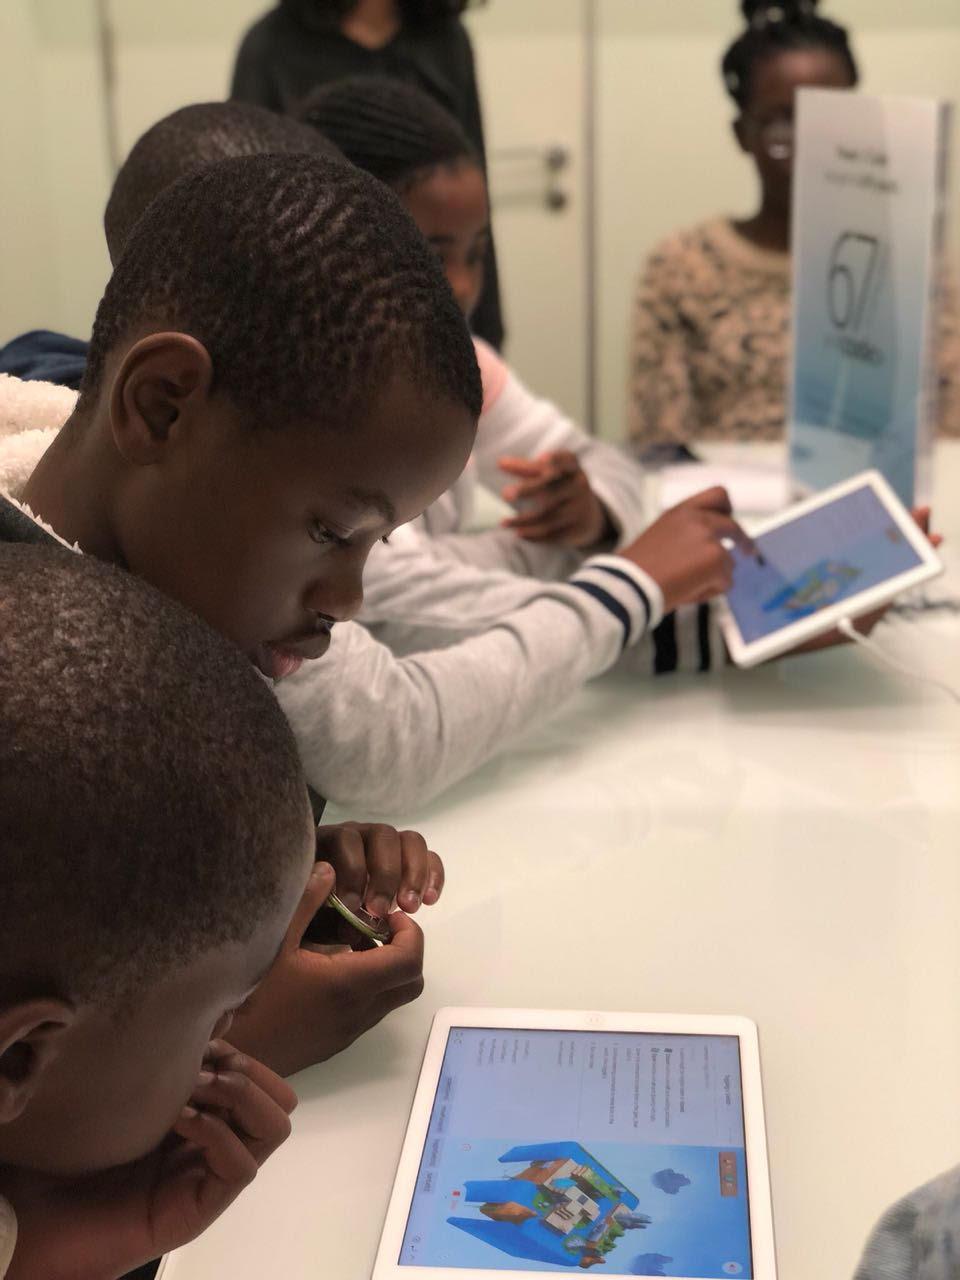 Free coding classes for kids - Tech Girl